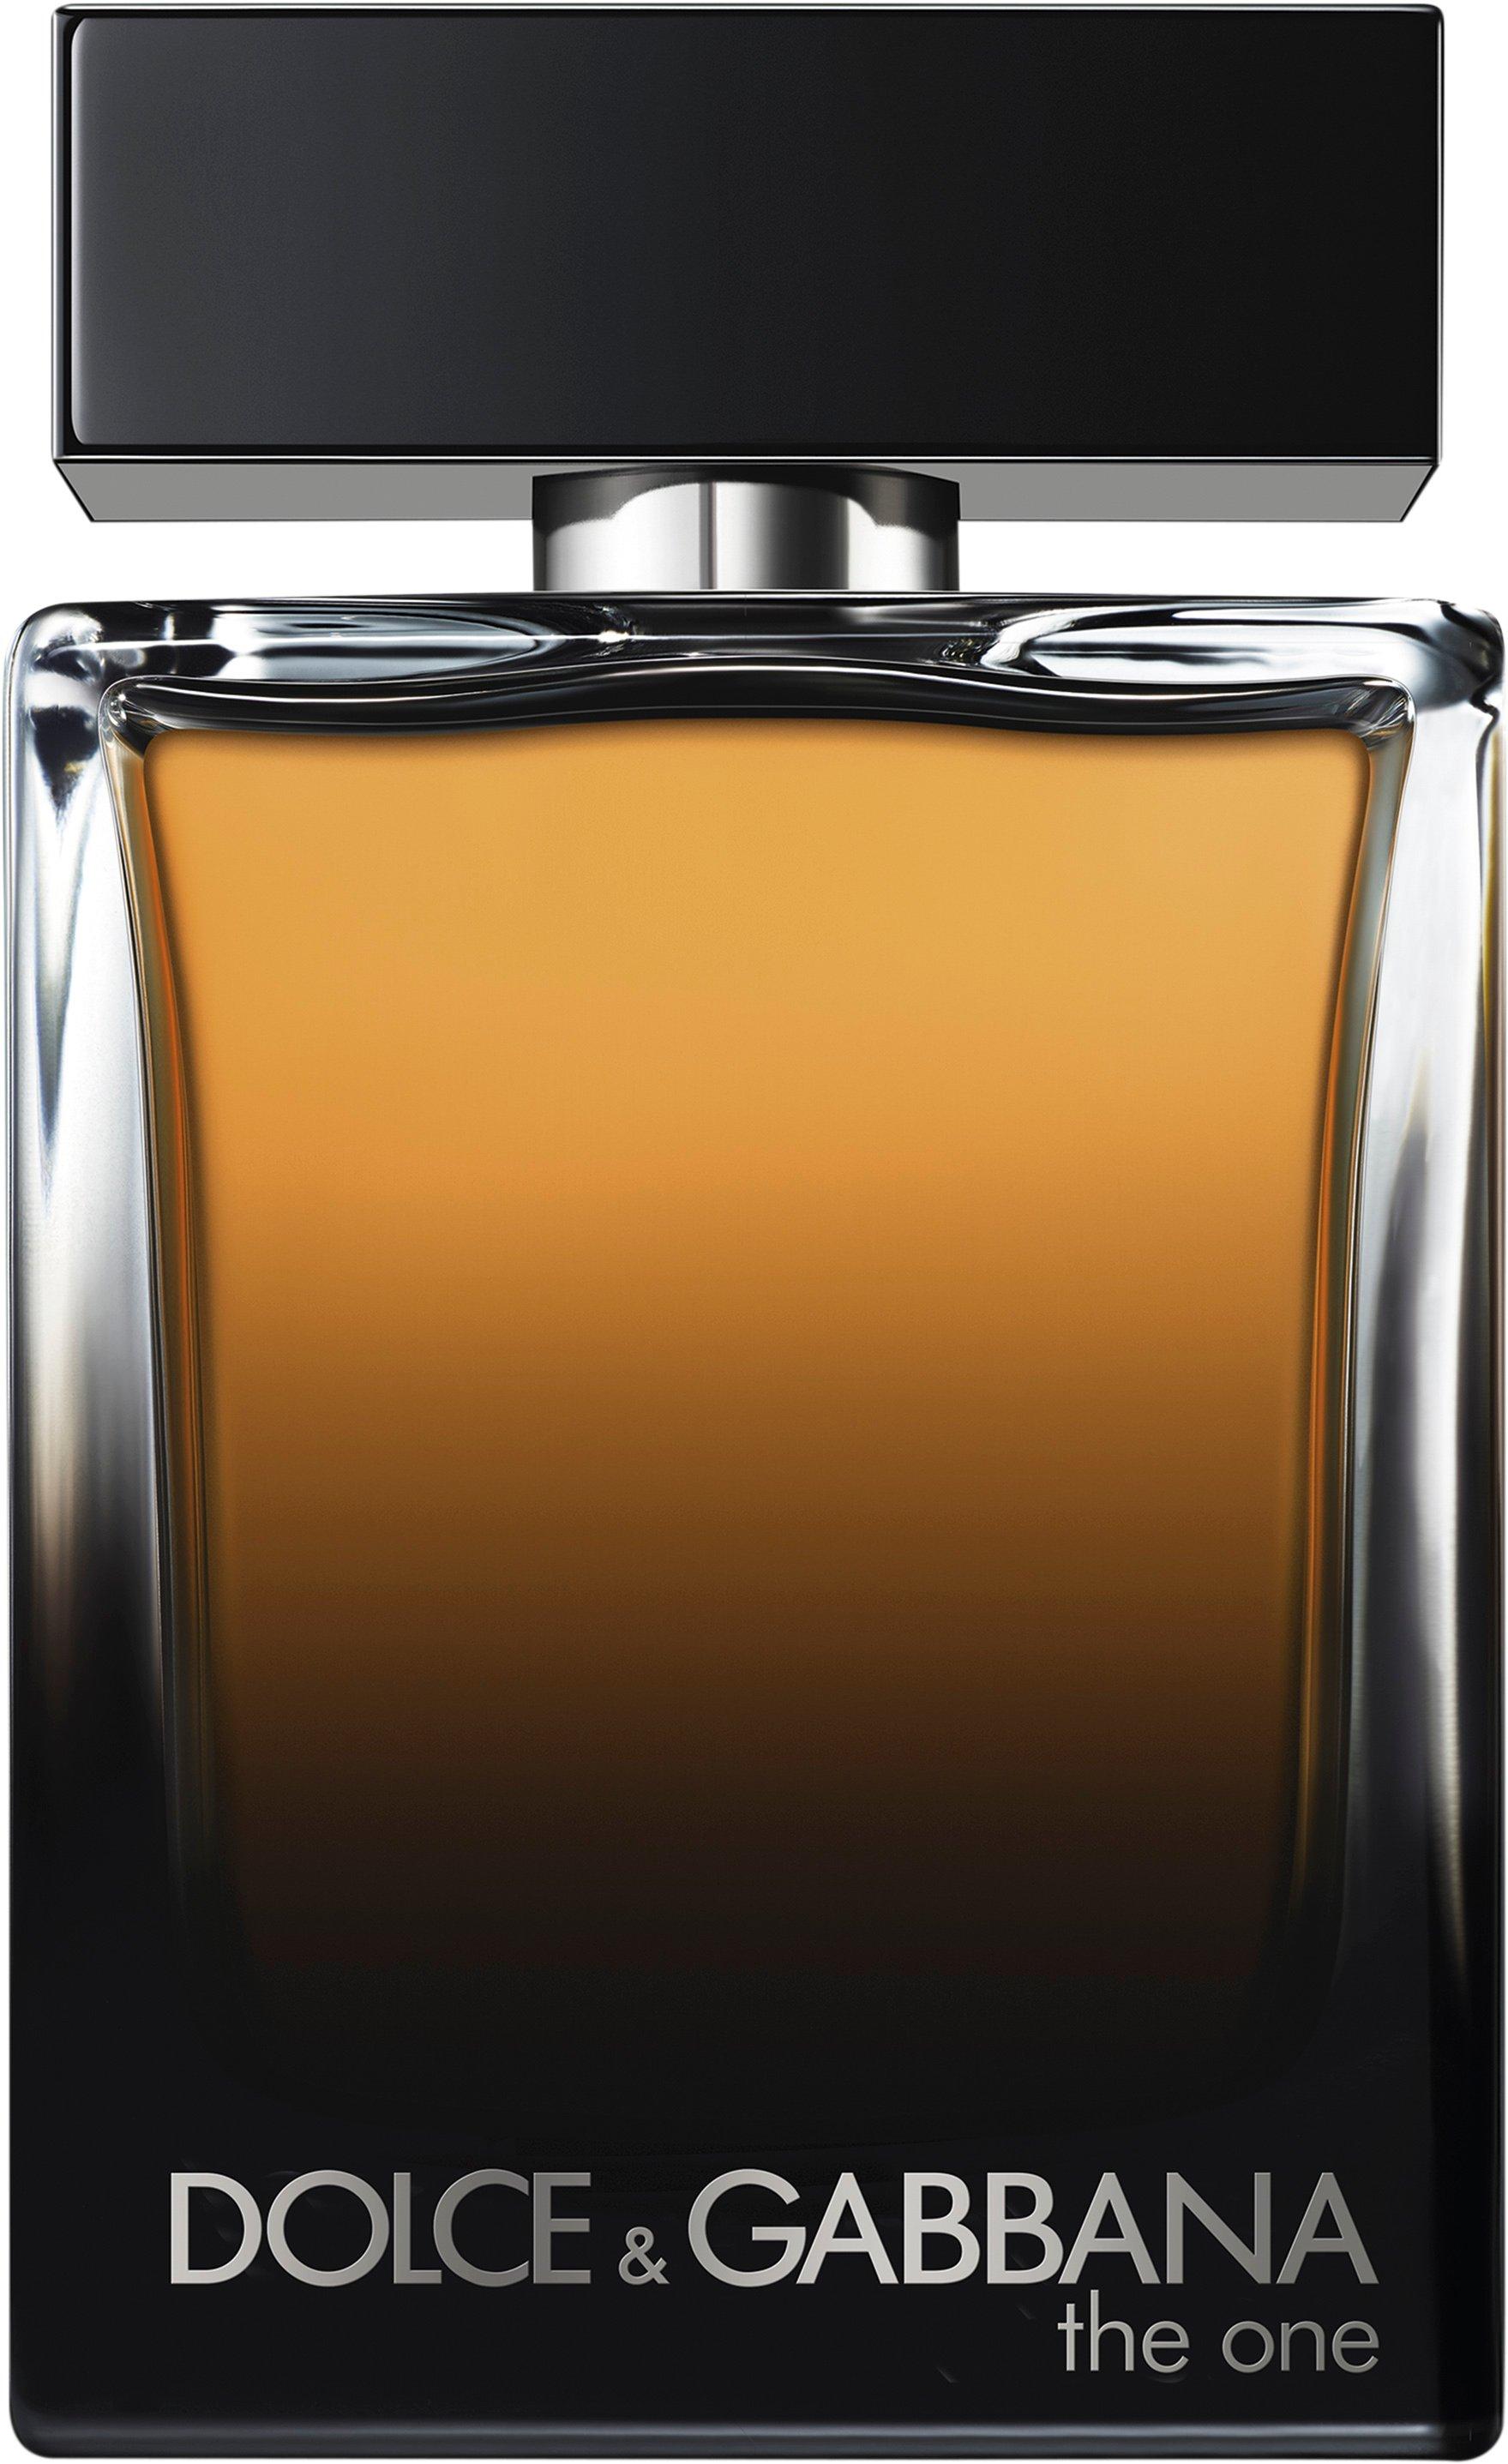 Dolce & Gabbana - The One Men EDP 50 ml